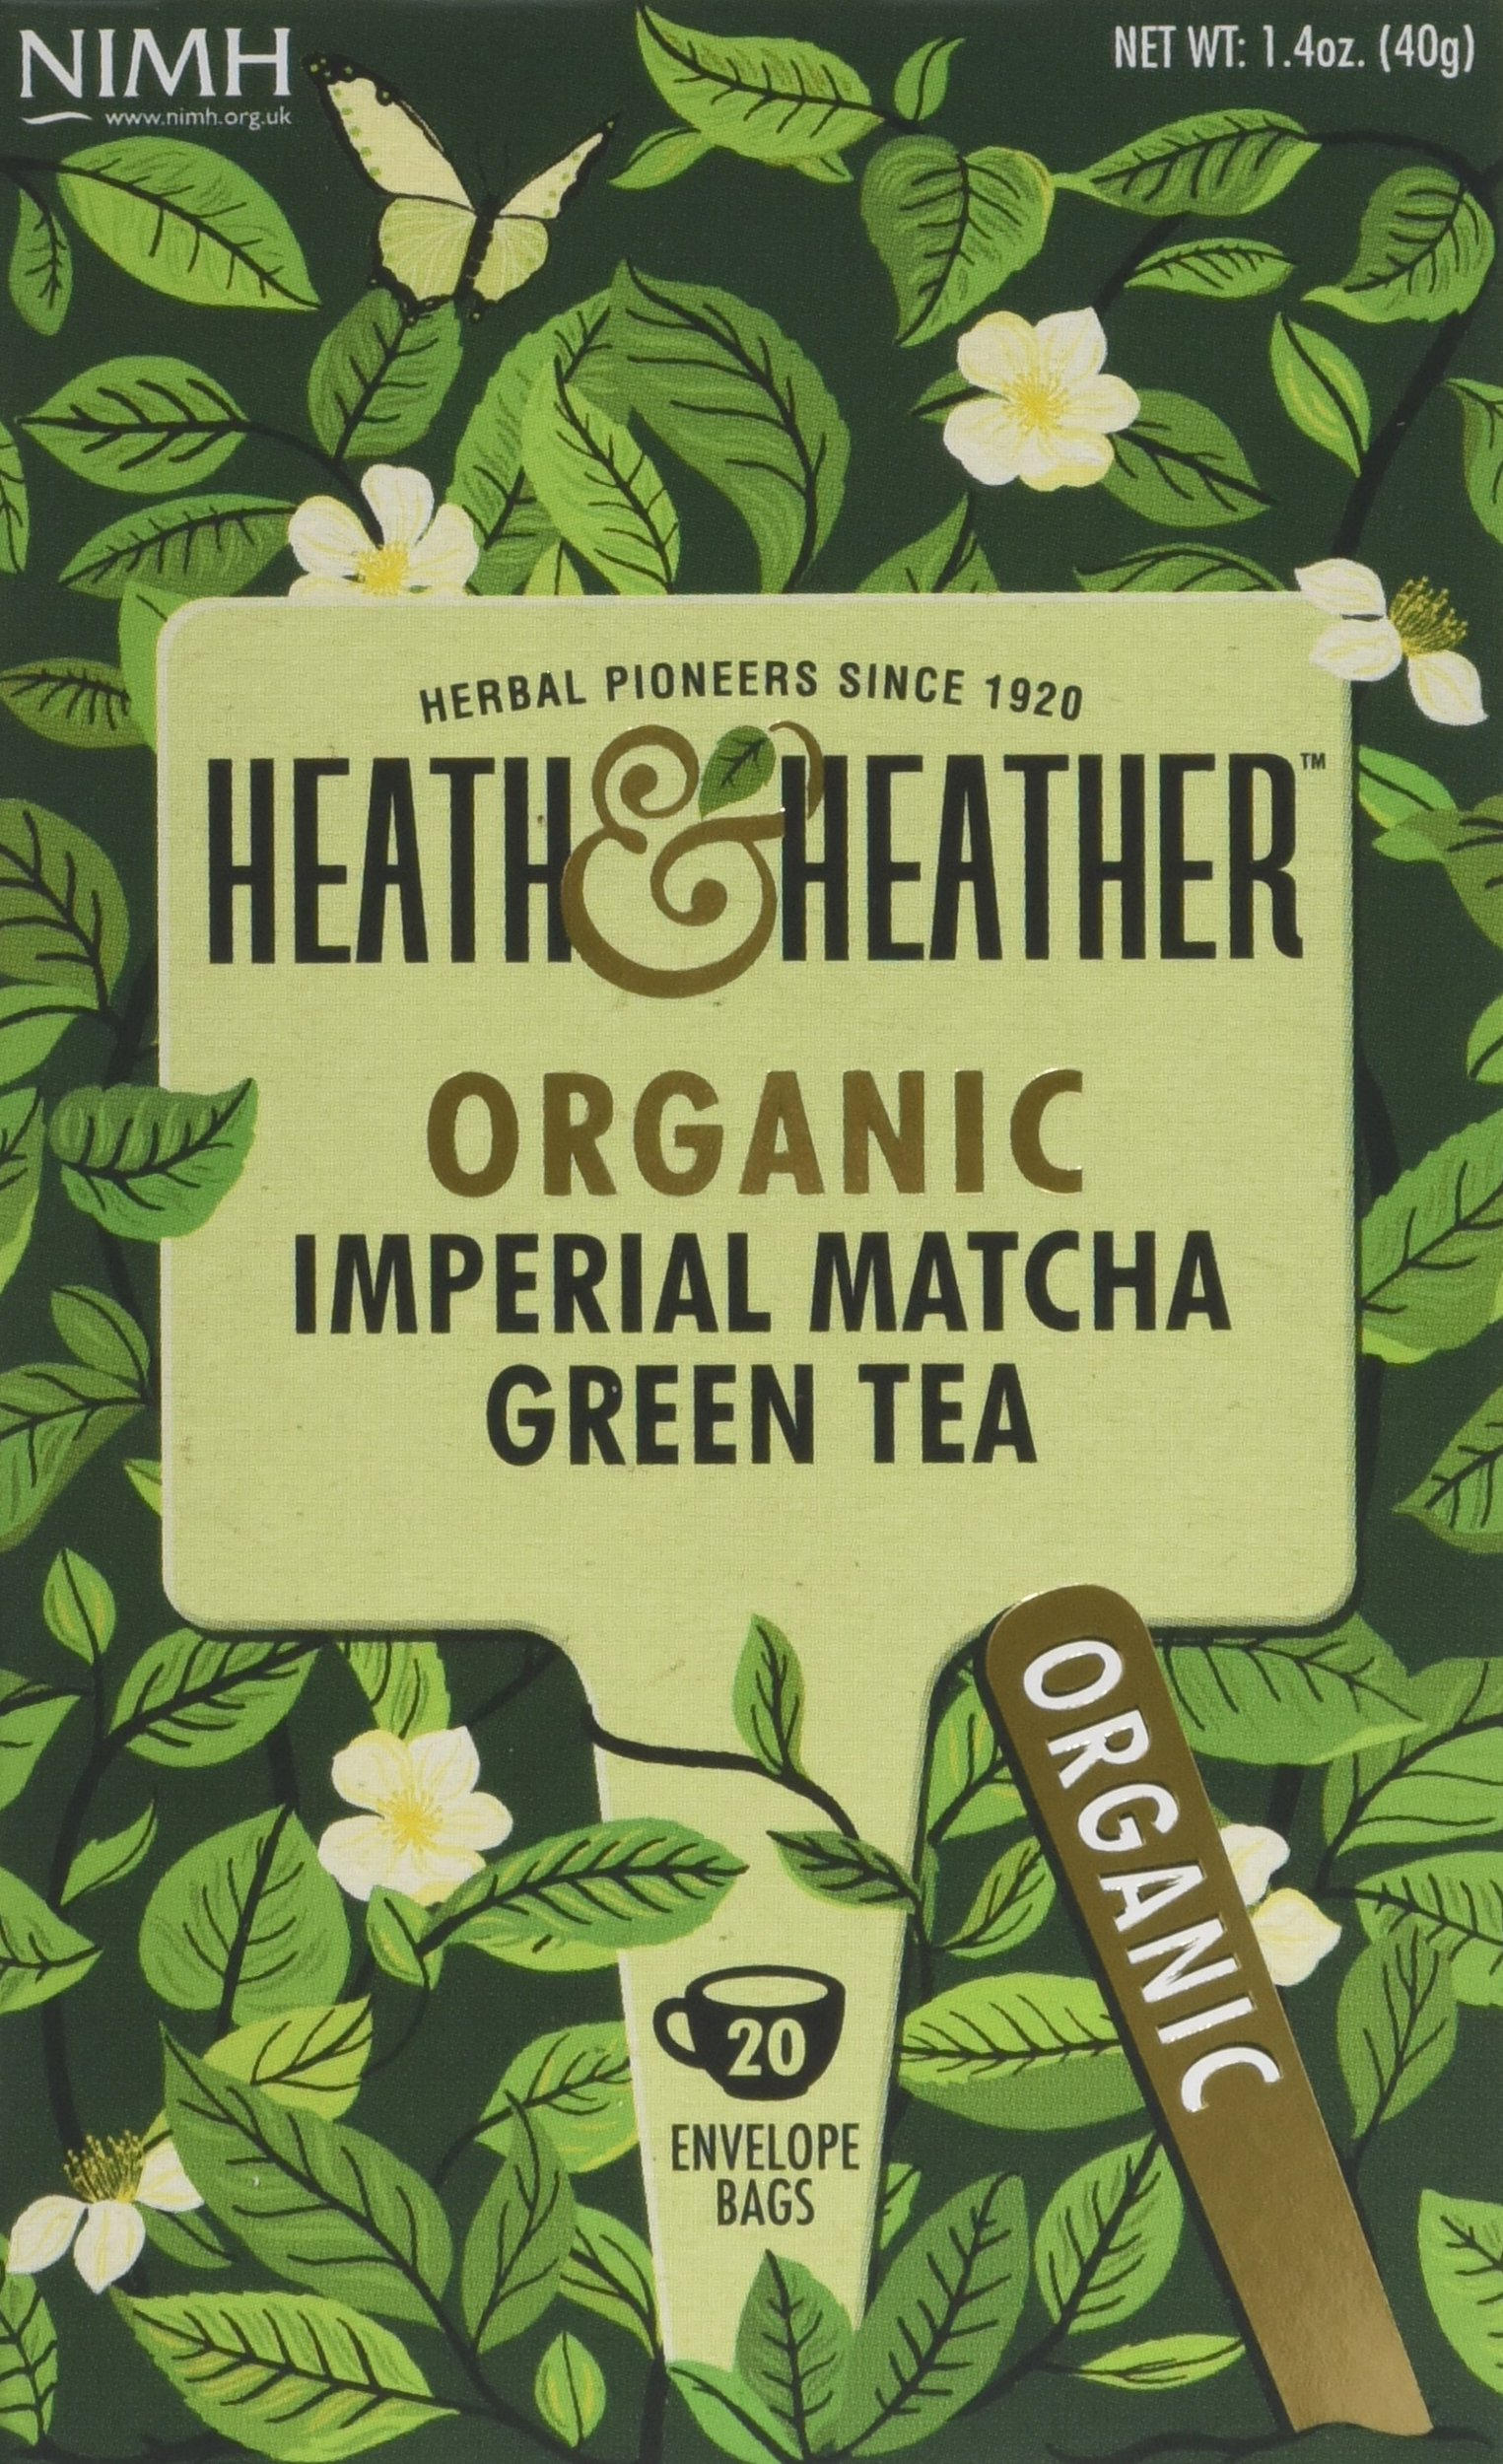 Heath & Heather organic green tea tea (soil association) (green tea) (matcha) (120 bags) (brews in 2-3 minutes)